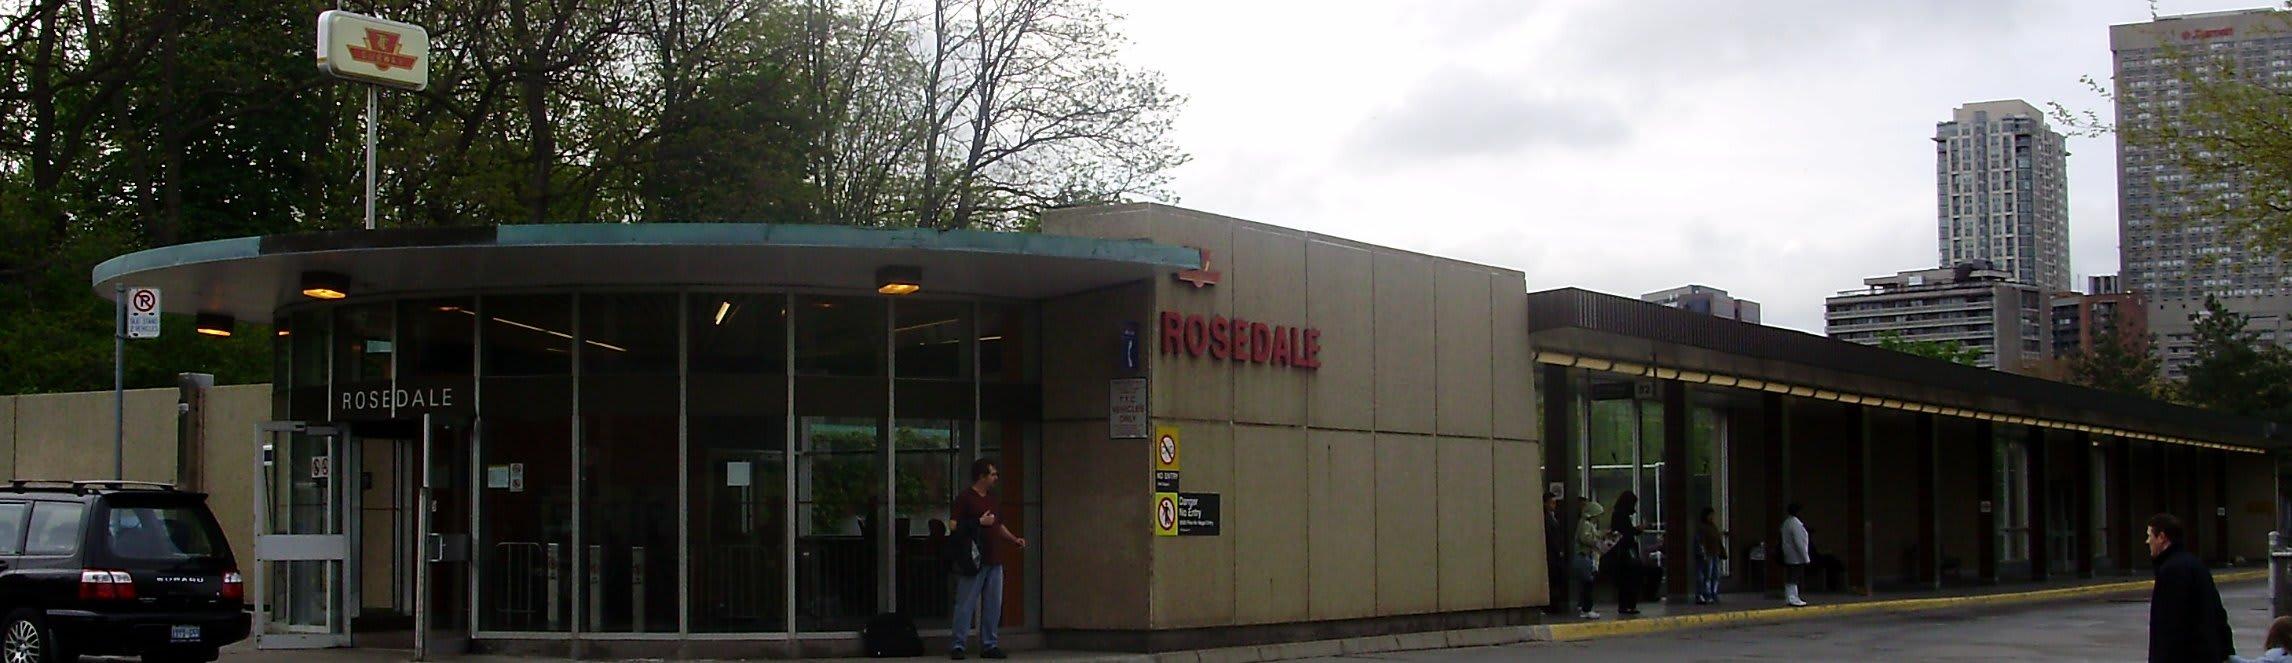 Rosedale Neighbourhood Real Estate  | Jethro Seymour, Top Toronto Real Estate Broker